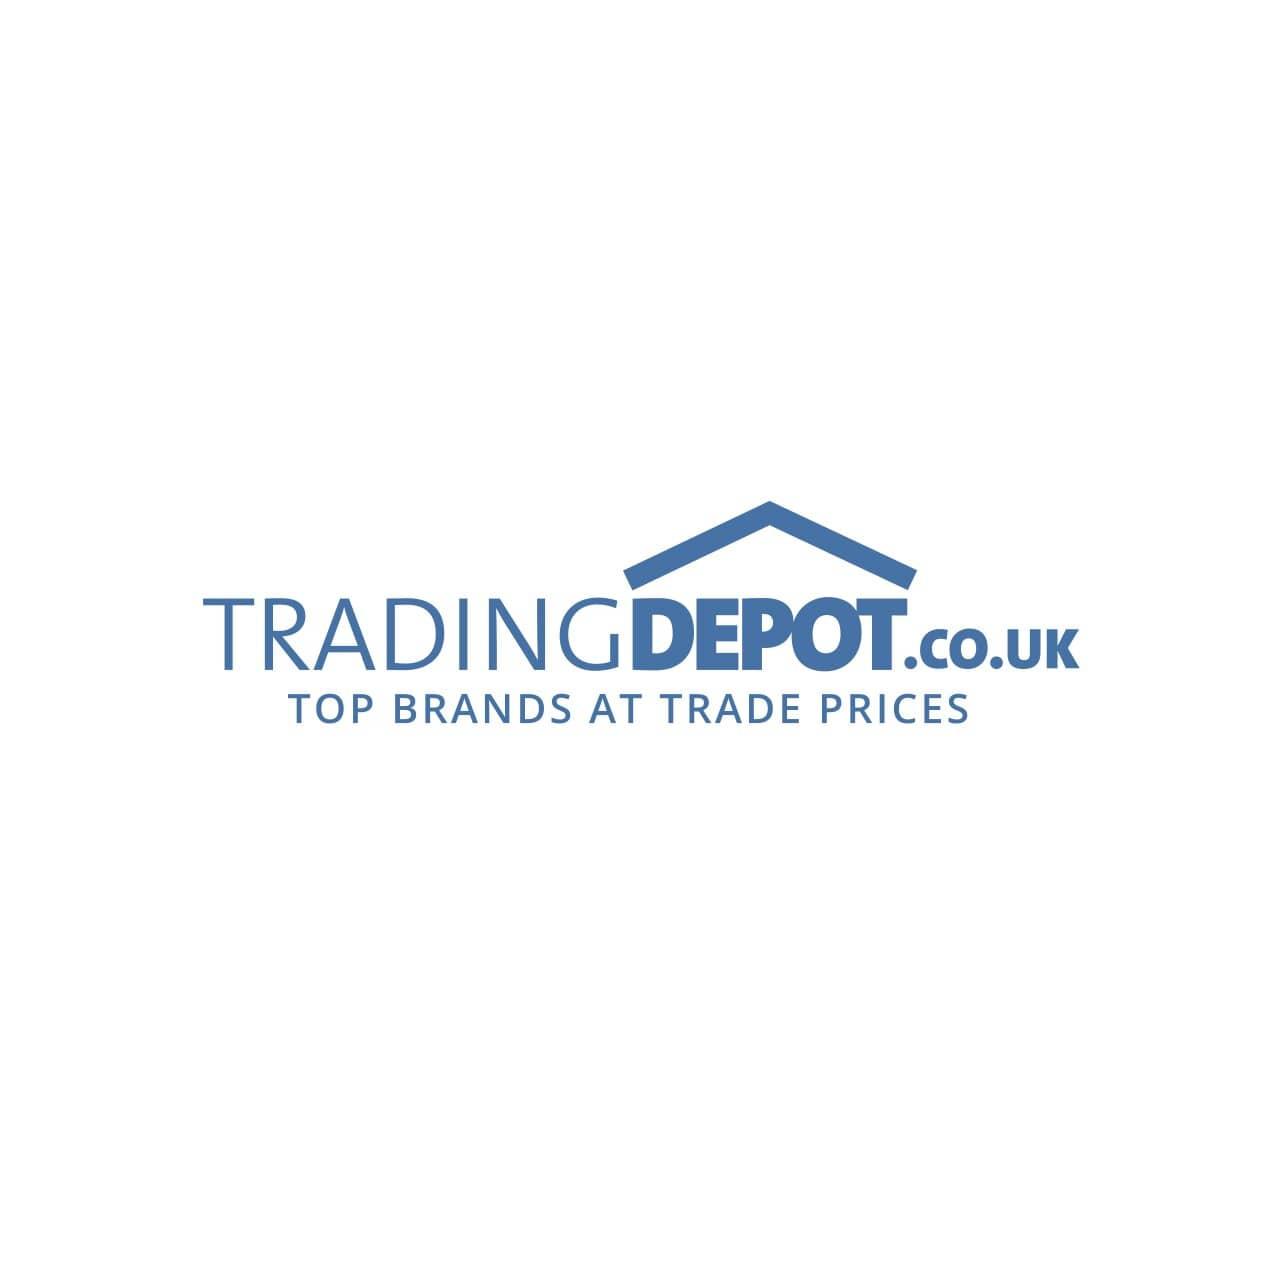 Velux  Integra Solar Roof Window White Polyurethane Centre Pivot Easy Clean Enhance Noise Reduction Glazing 134 x 98cm - GGU UK04 006030